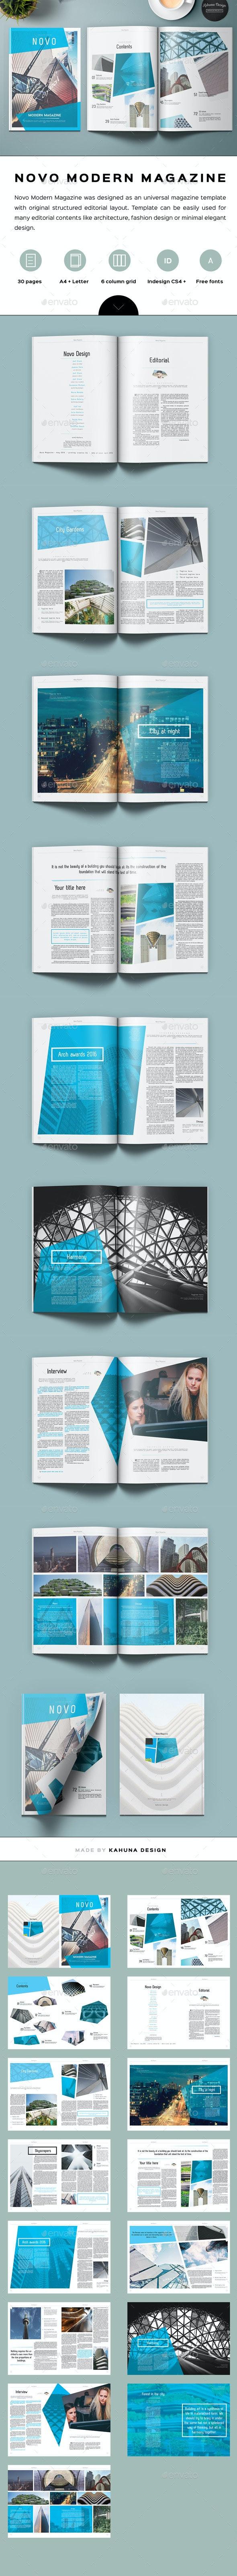 Novo Modern Magazine - Magazines Print Templates